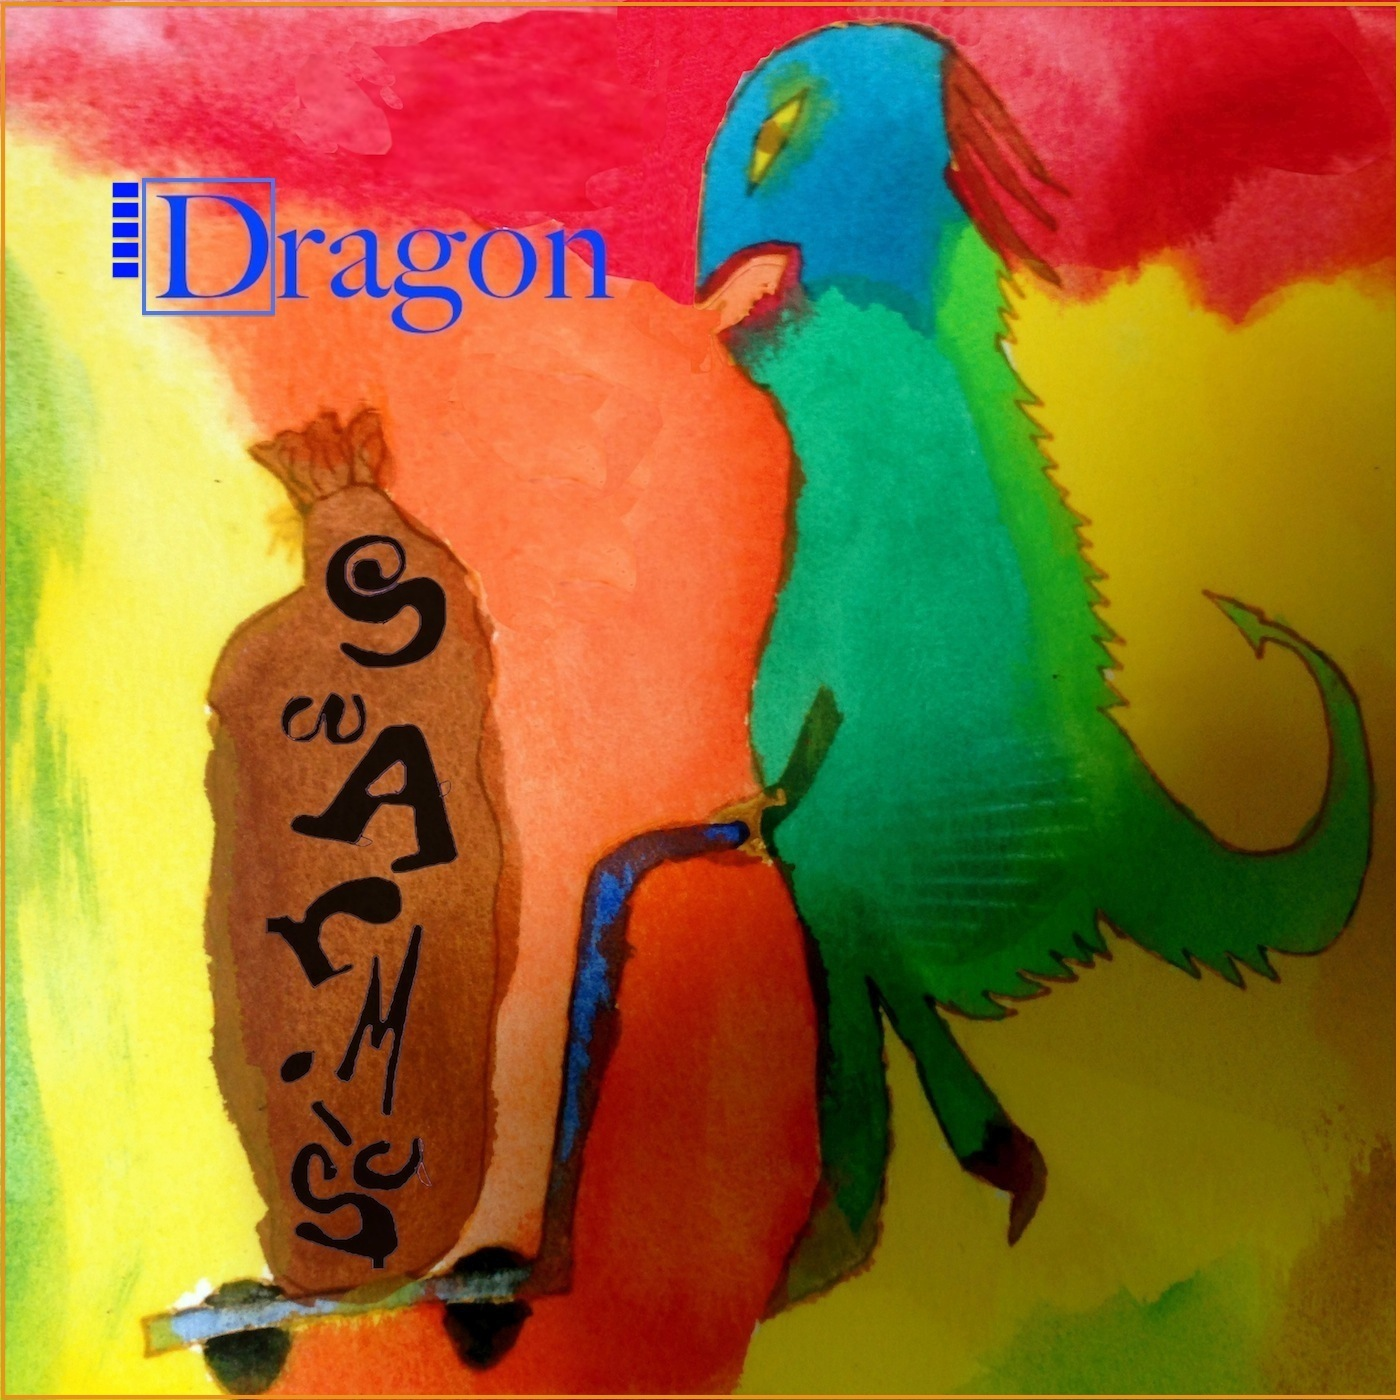 Dragon_CDArt_Gabe4b3.jpg